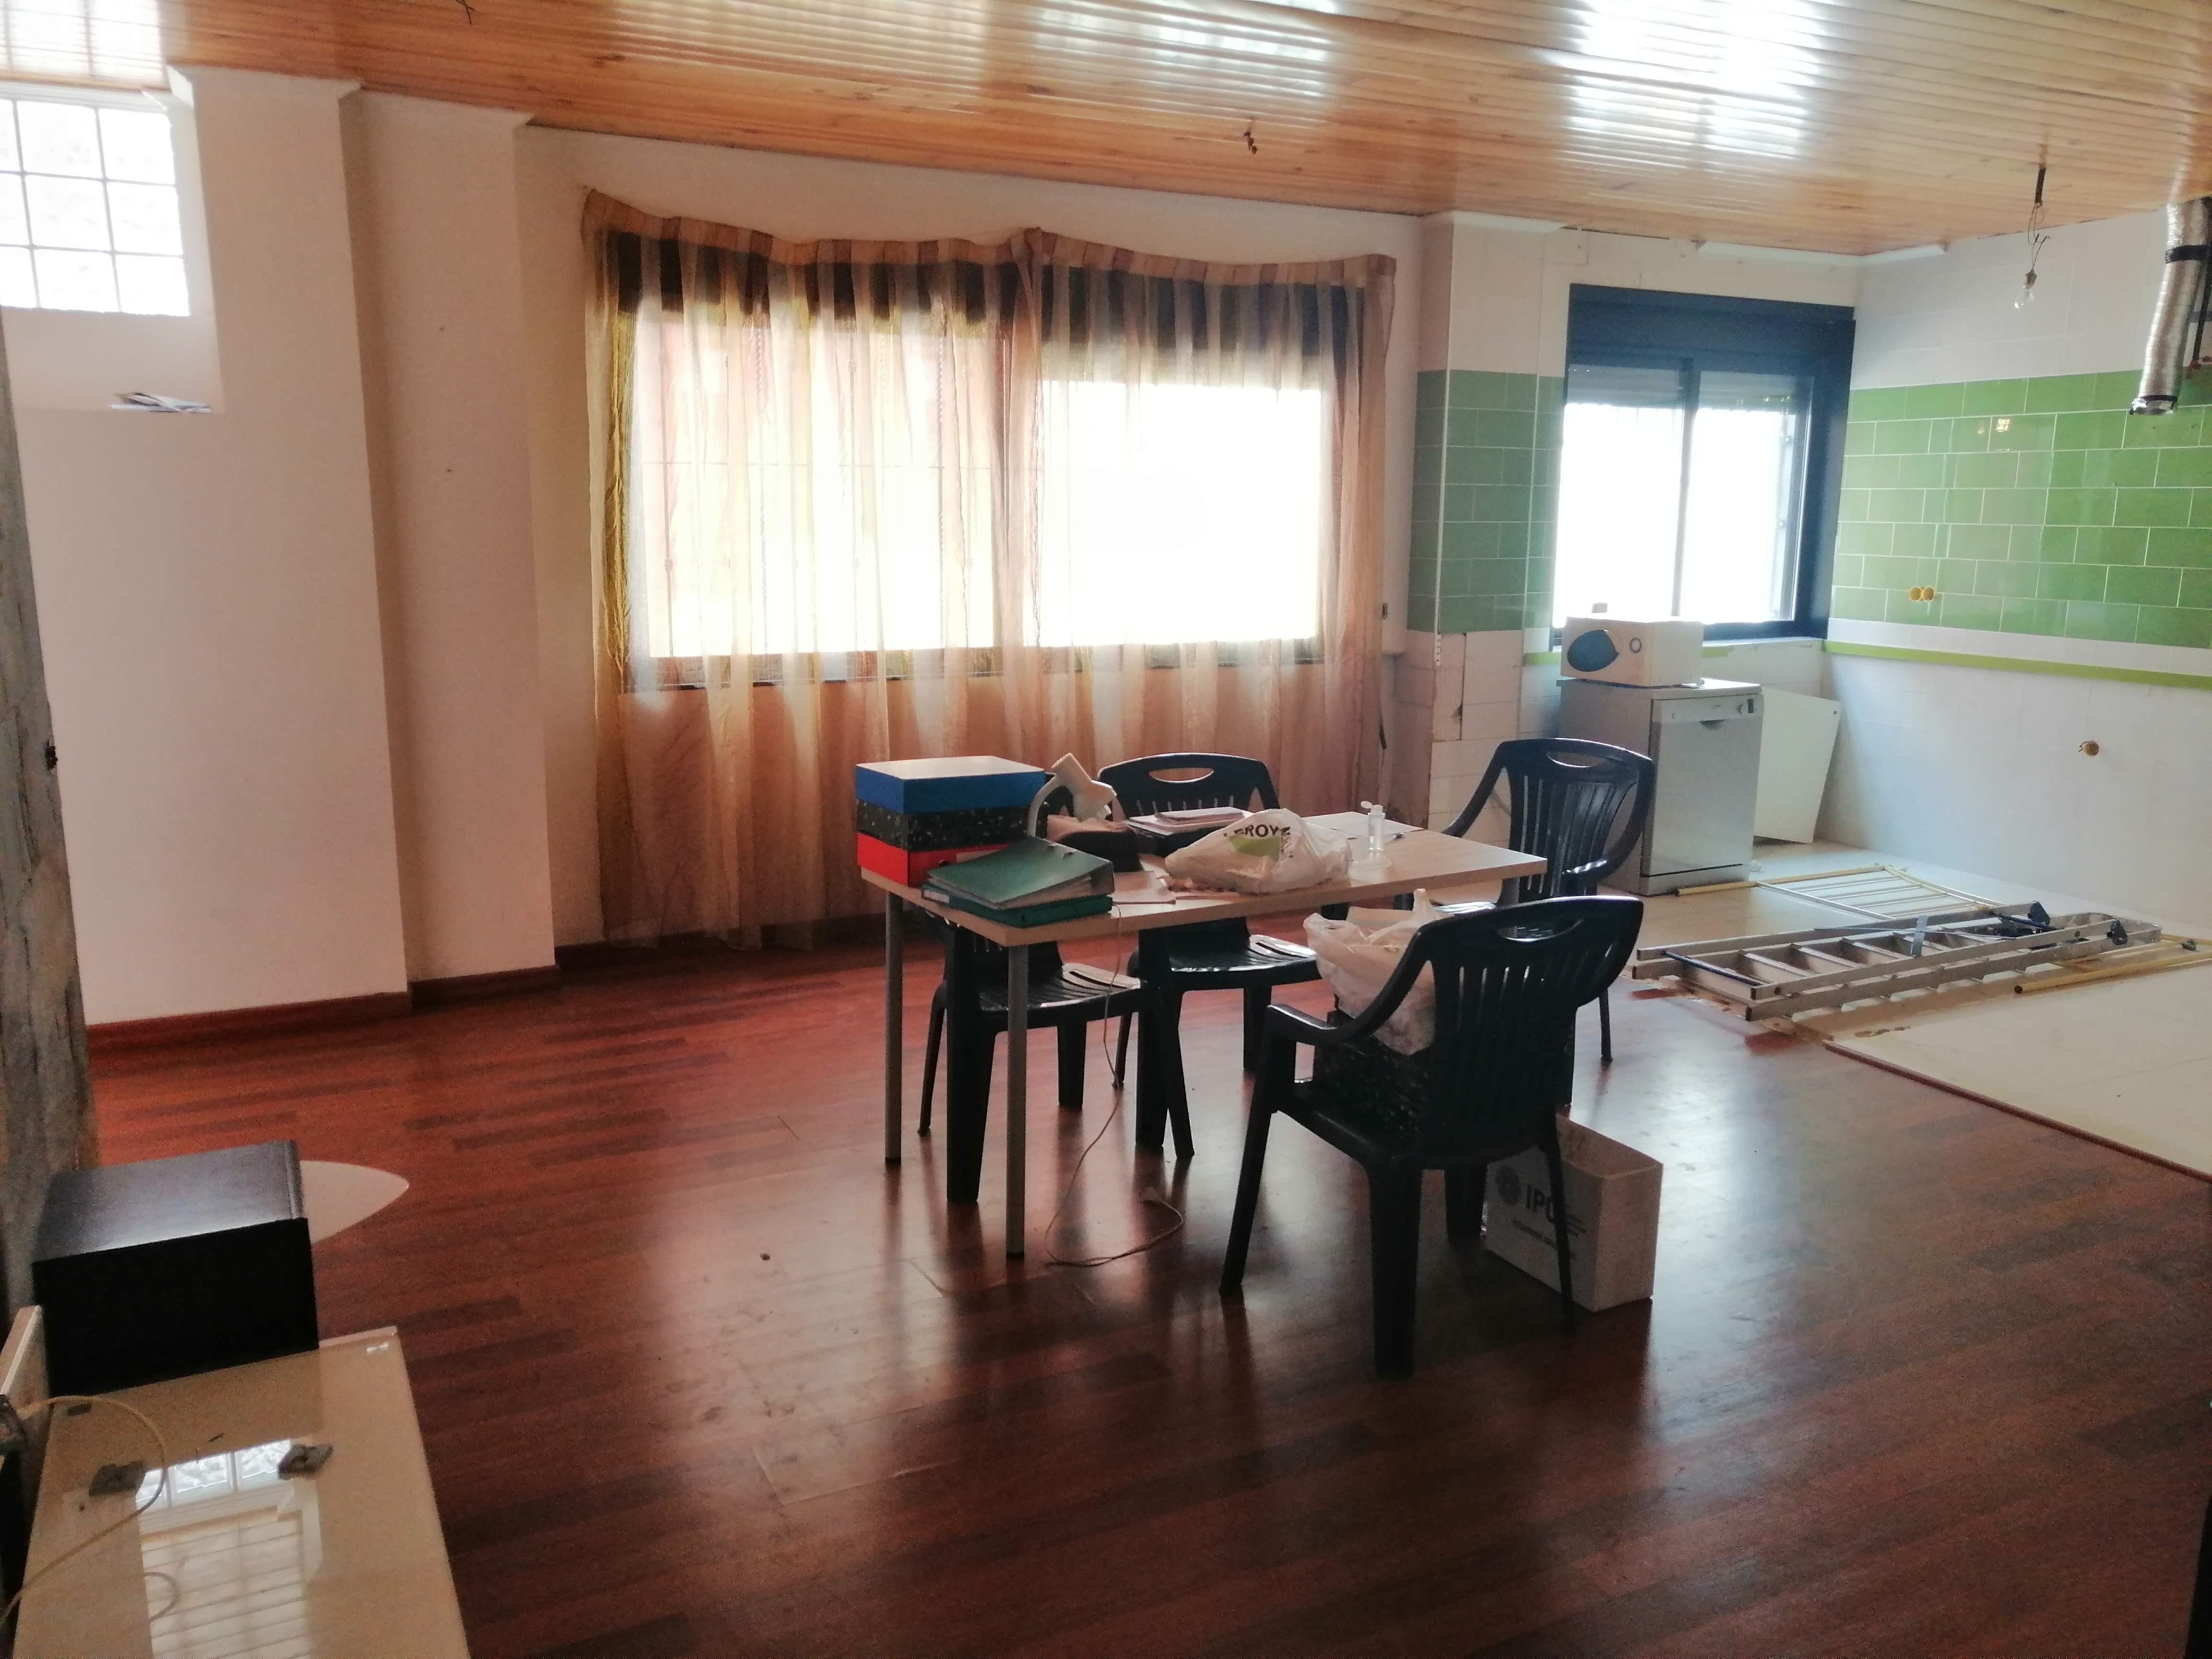 Piso de 2 habitaciones en alquiler en Albalat dels Sorells – Ref. 001005